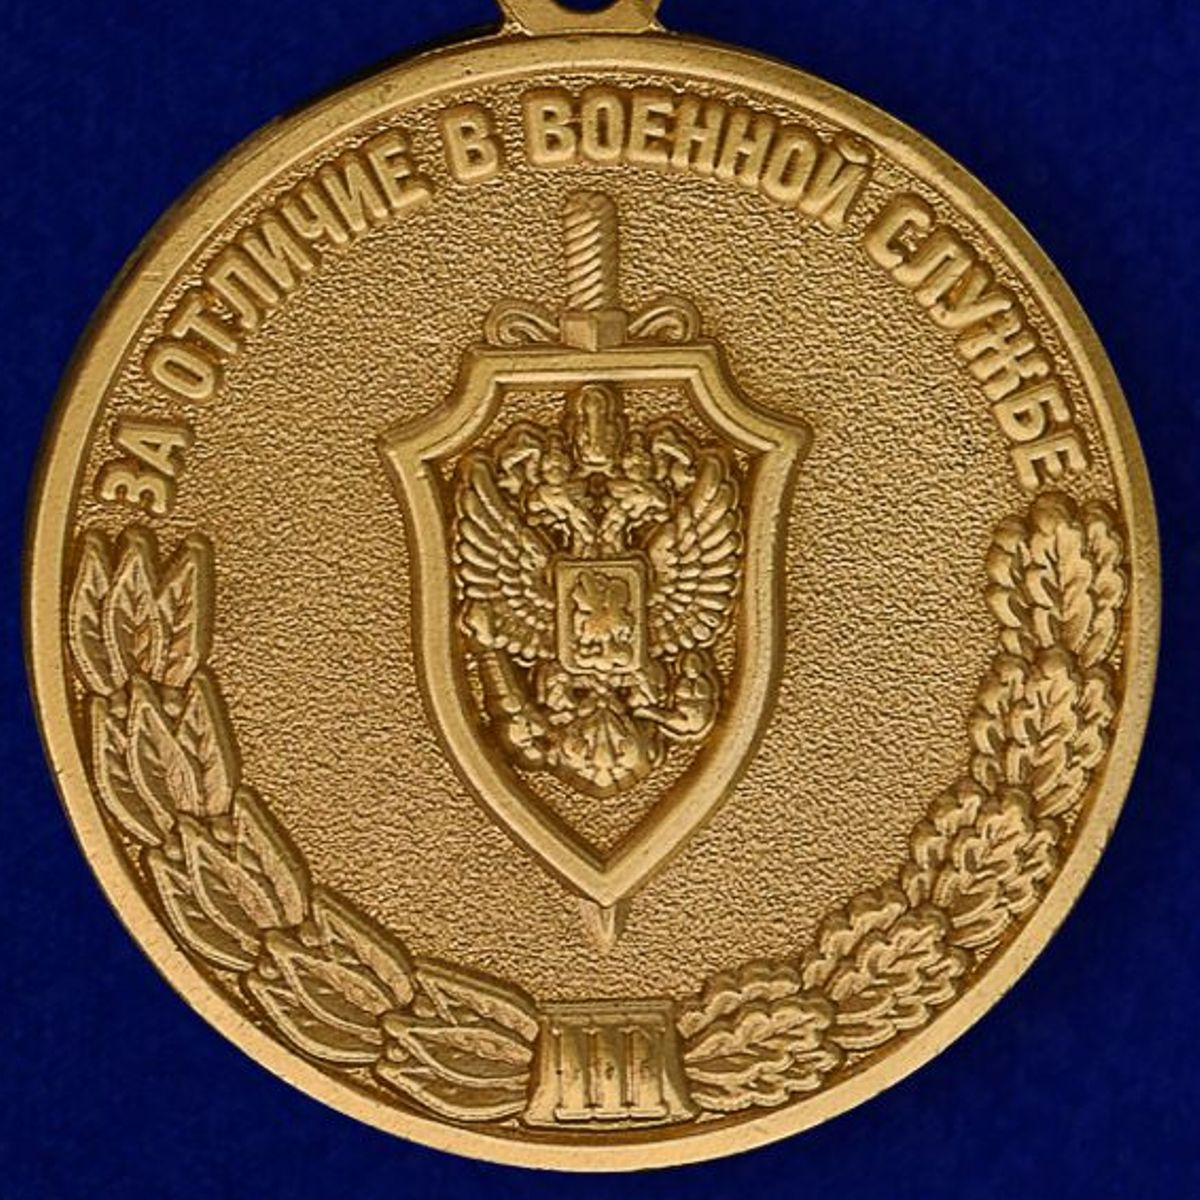 Купить медали ФСБ в Военпро